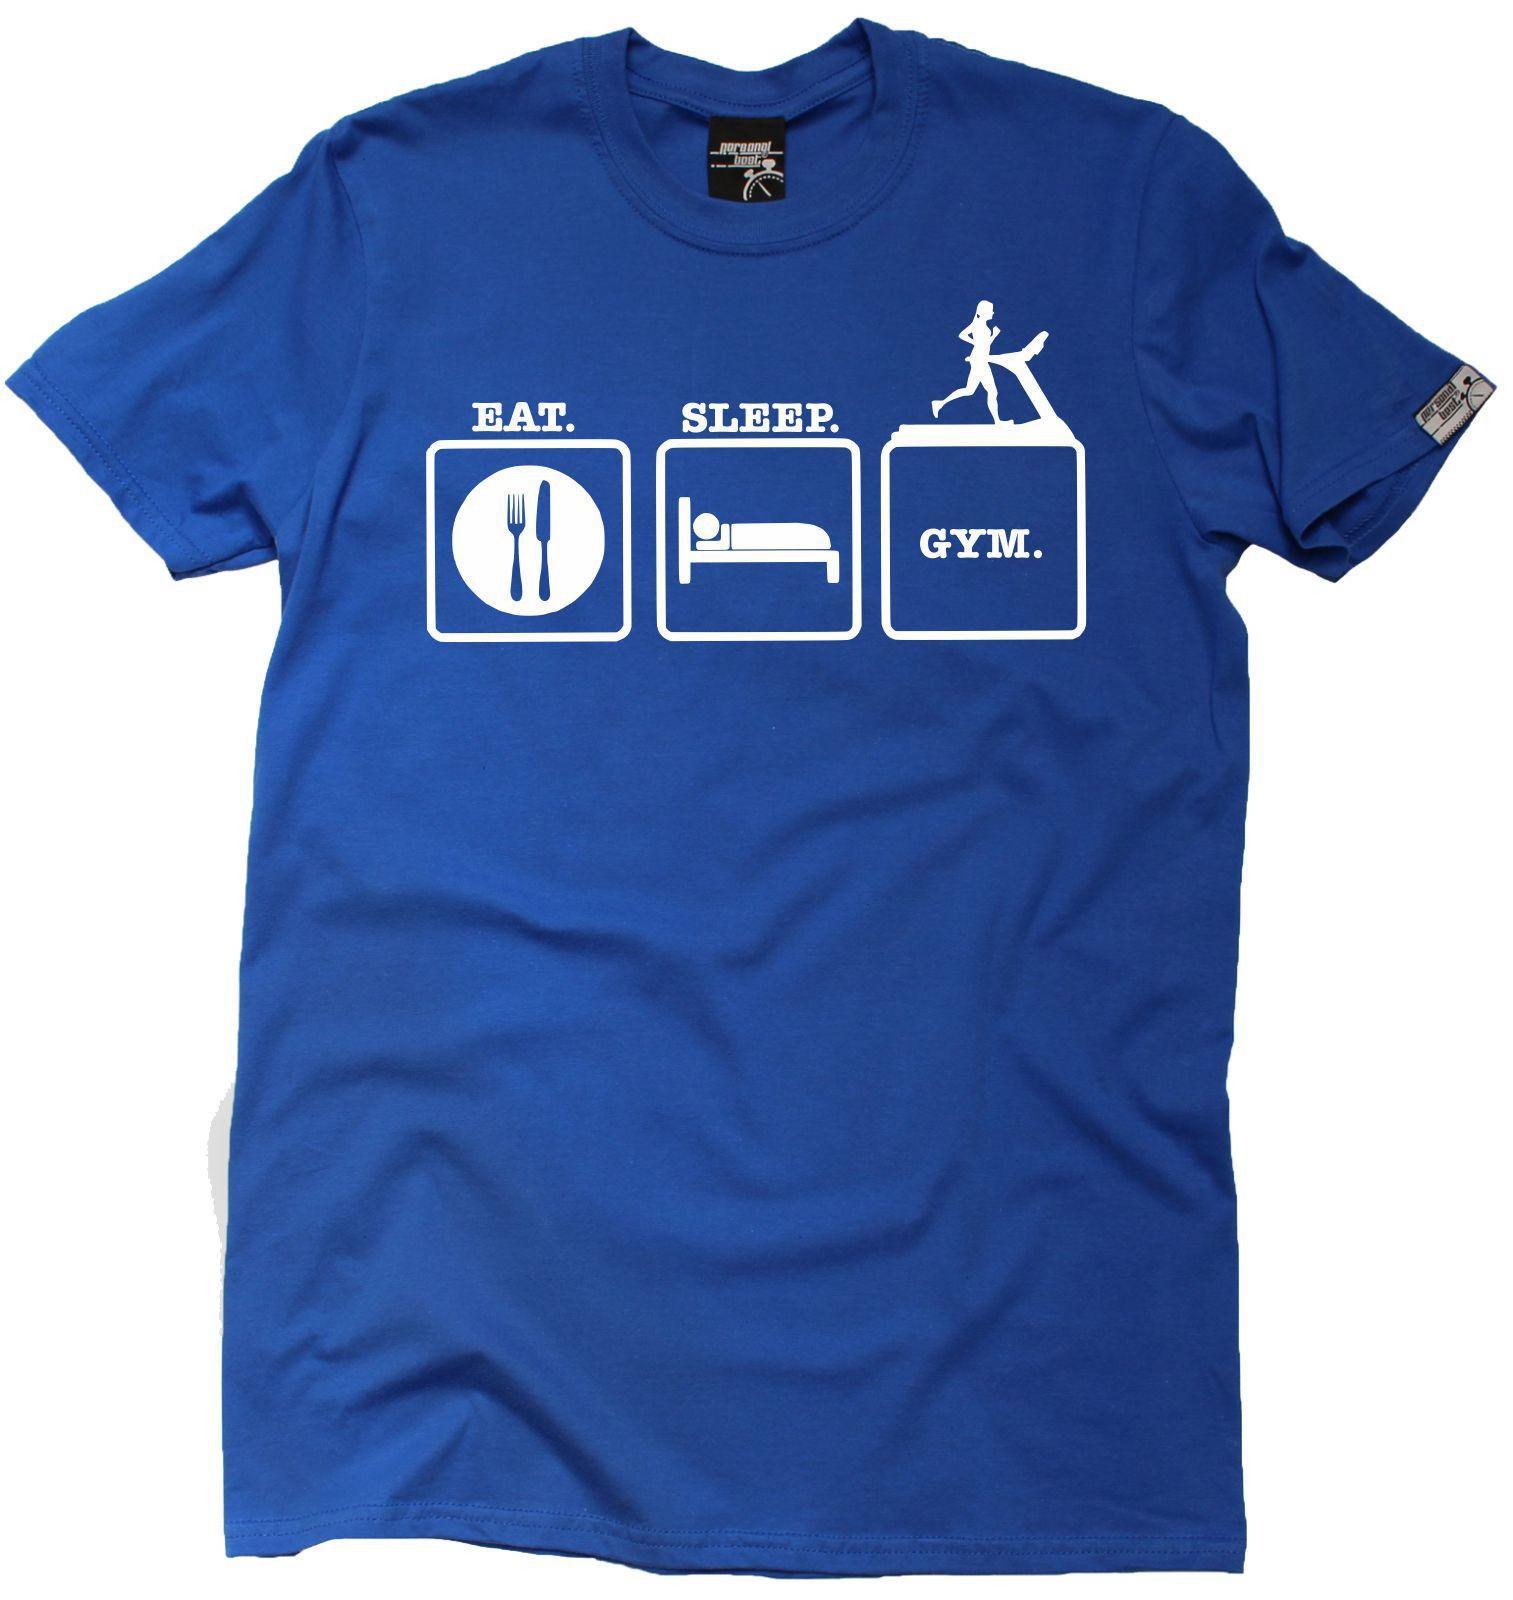 Eat Sleep Gym Treadmill MENS T SHIRT Birthday Funny Gift Present Running Runner Shirt Prints Funky Designs From Spreadshirtinc